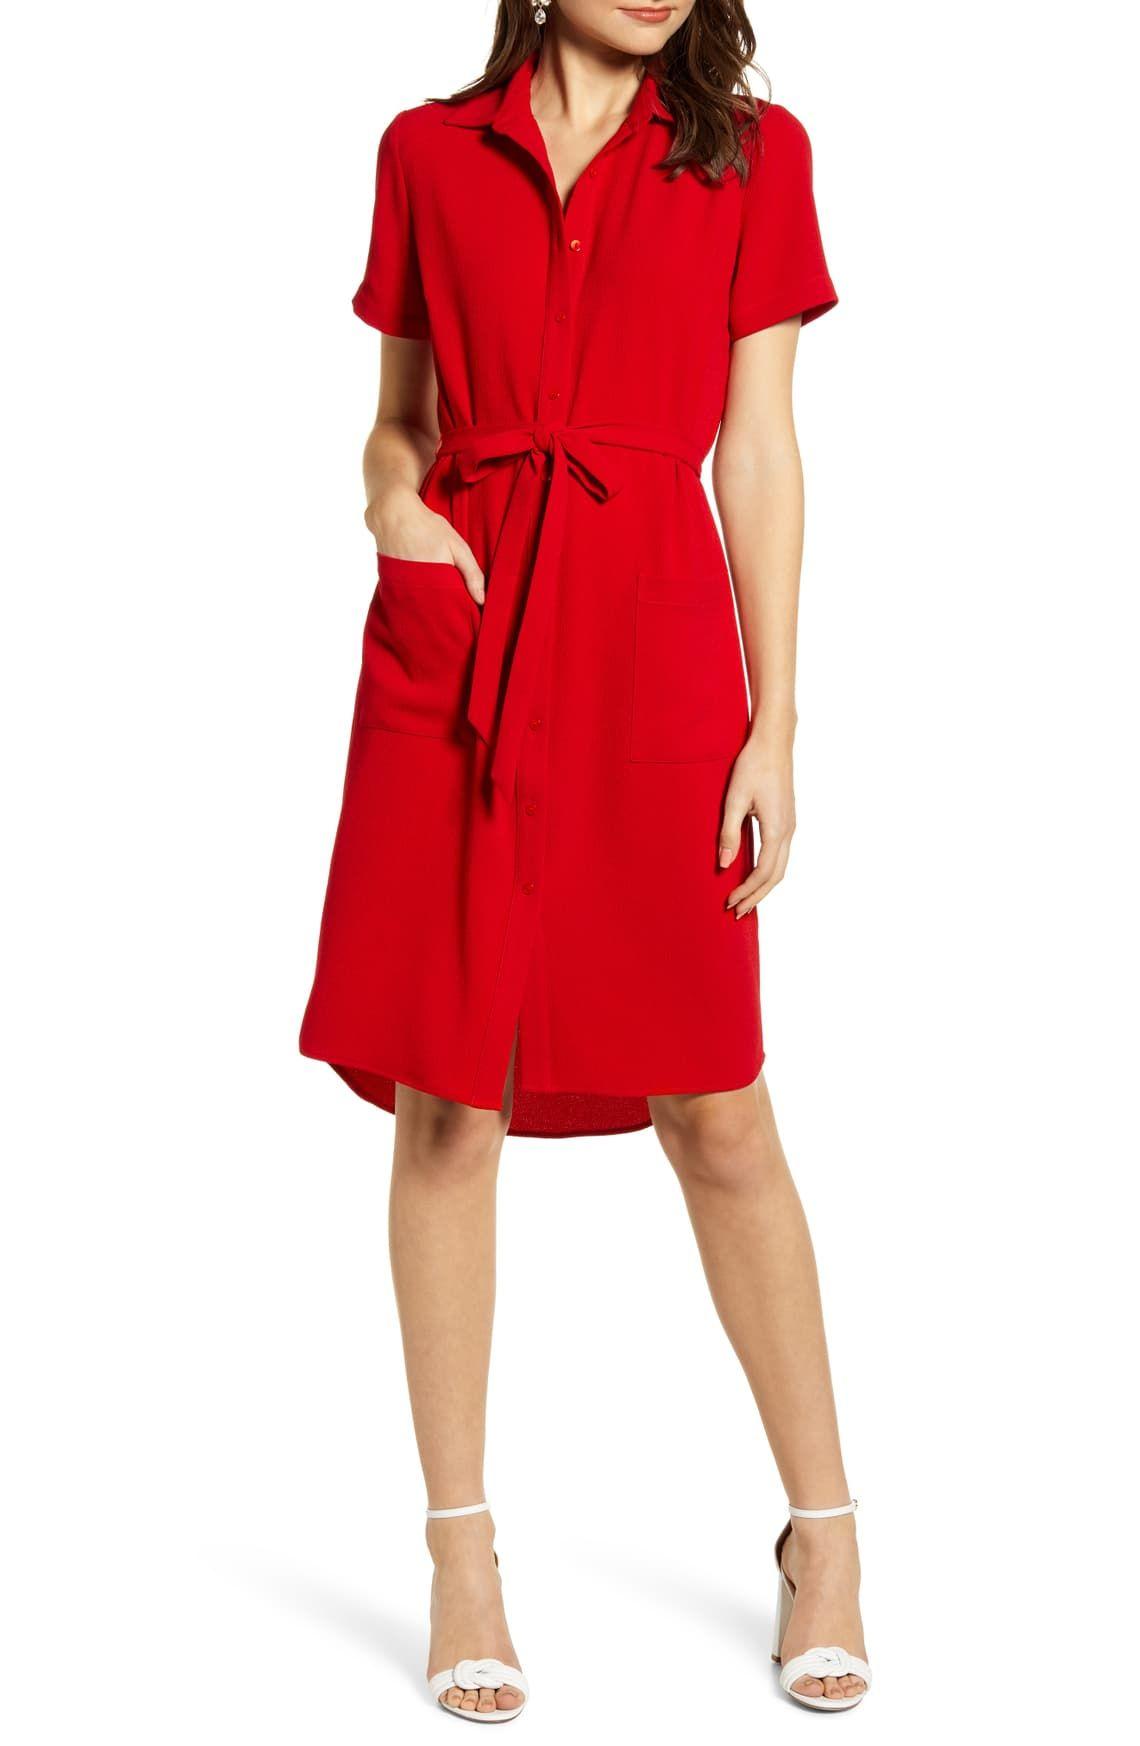 Rachel Parcell Everyday High Low Shirt Dress Nordstrom Exclusive Nordstrom High Low Shirt Dress Nordstrom Dresses Red Slip Dress [ 1746 x 1140 Pixel ]